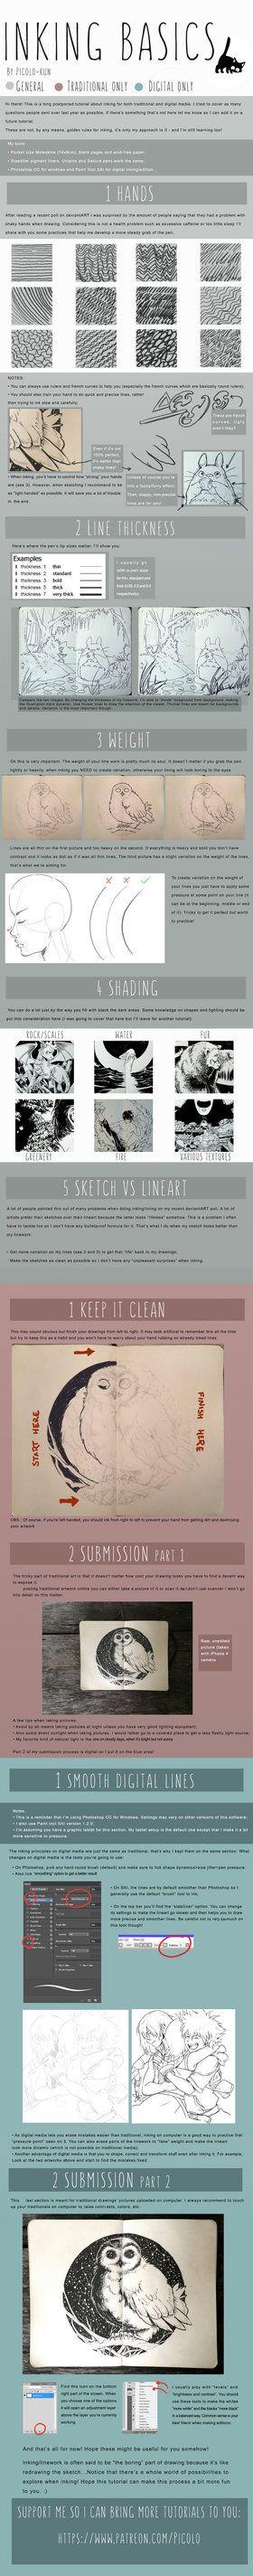 Inking Tutorial by Picolo-kun on DeviantArt